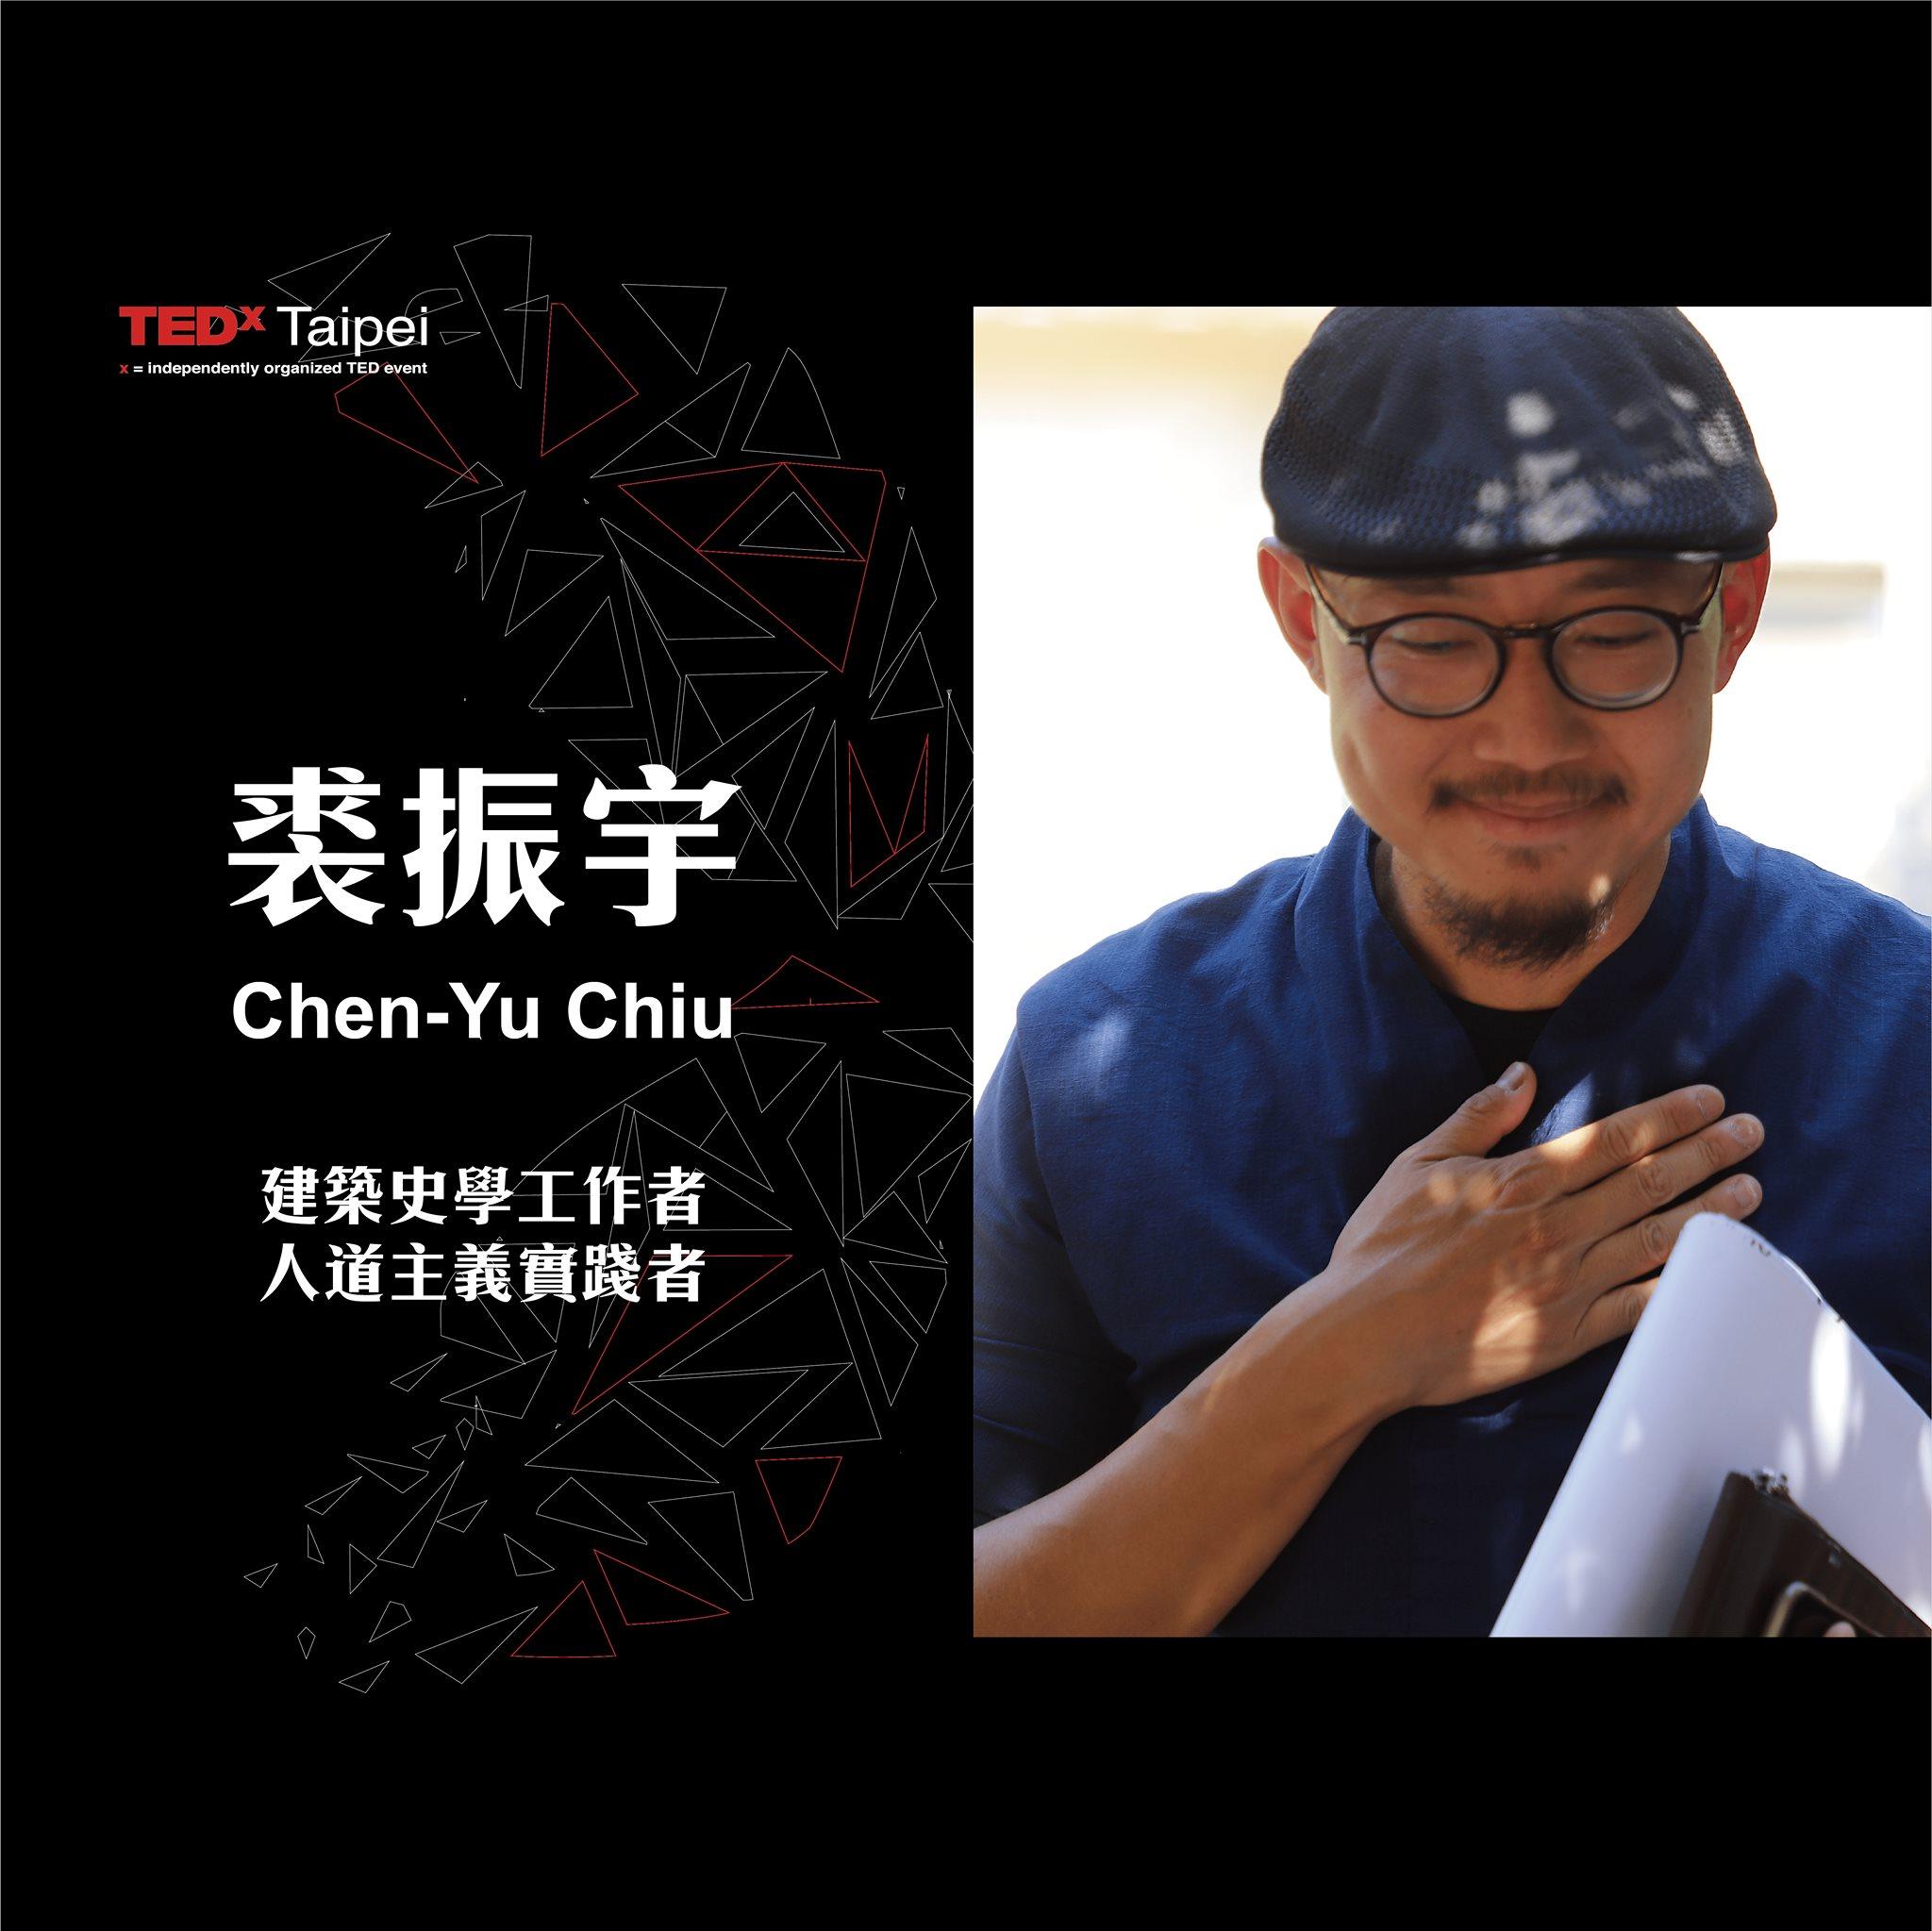 2020 TEDxTaipei 年會 Reach!實現 講者搶先看:雷伊漢勒世界公民中心執行長裘振宇